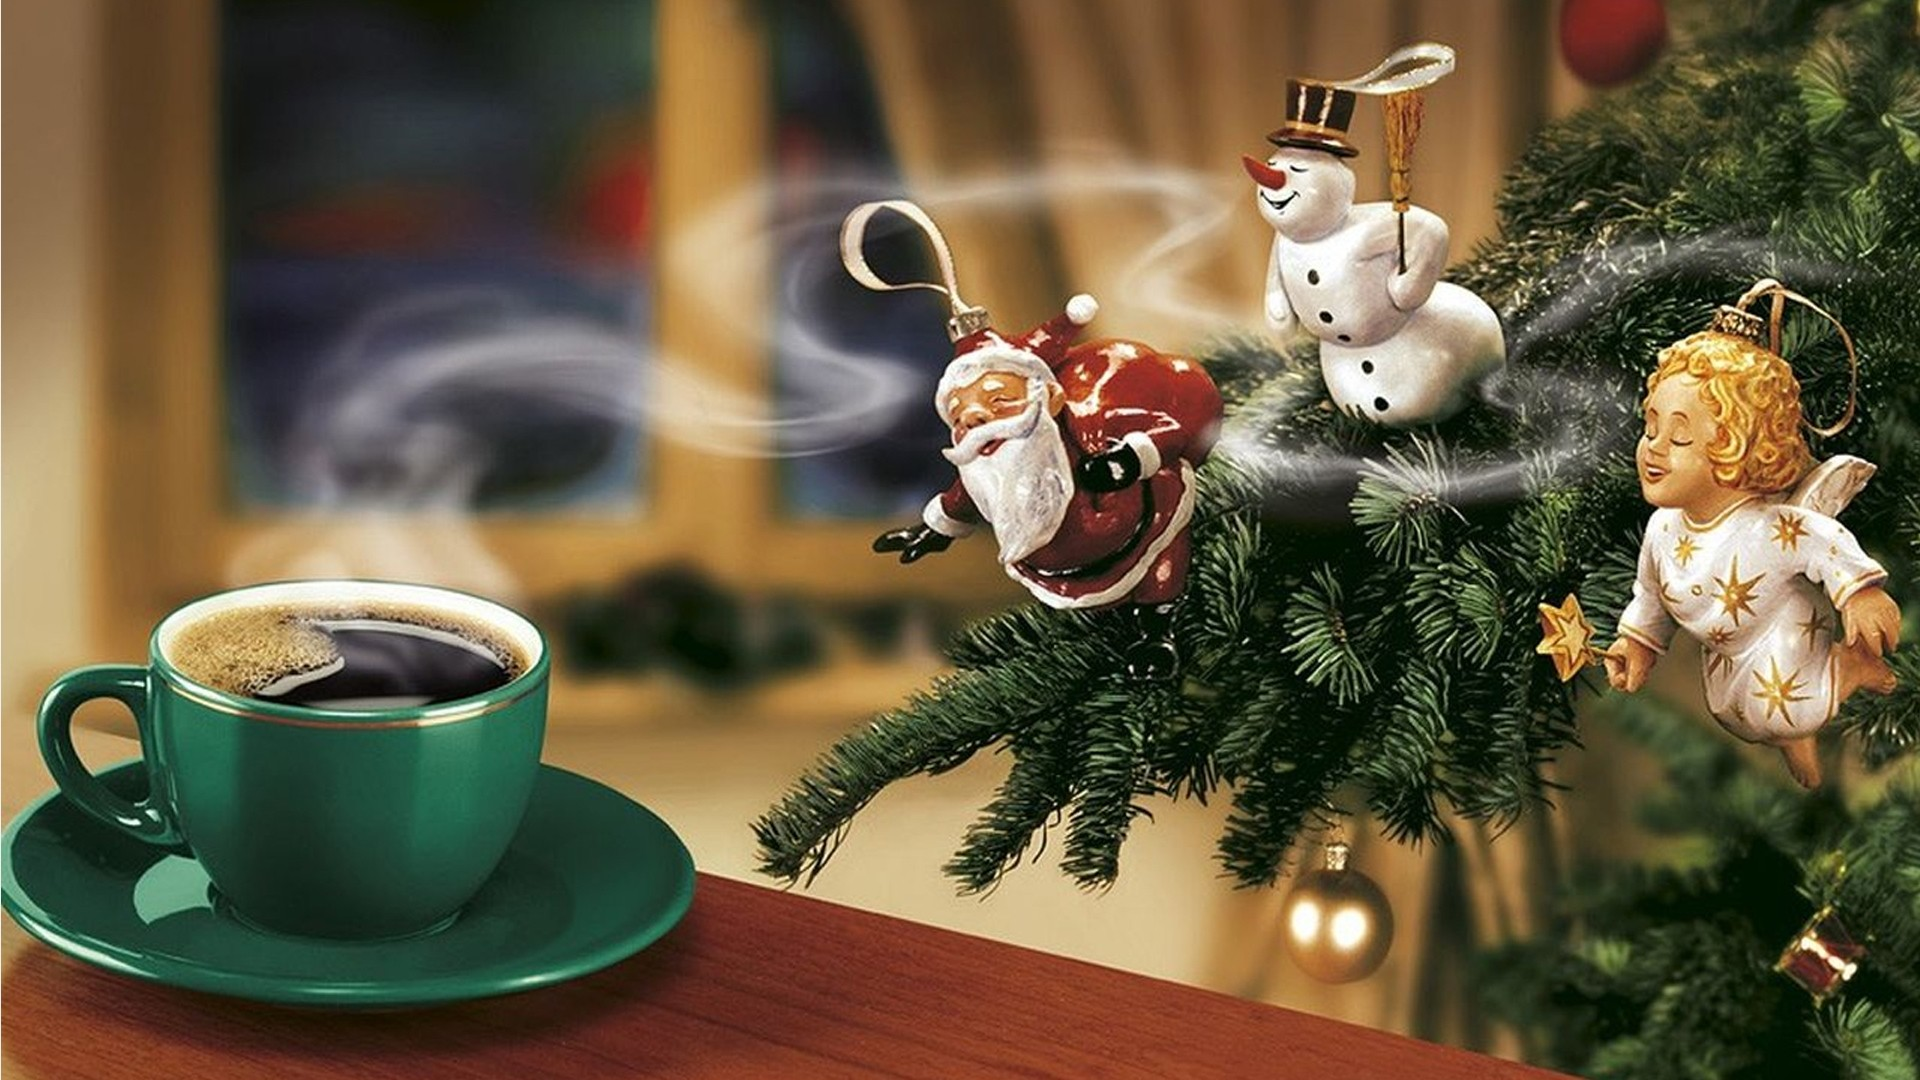 Wallpaper new year, coffee, christmas tree, santa claus, snowman,  angel